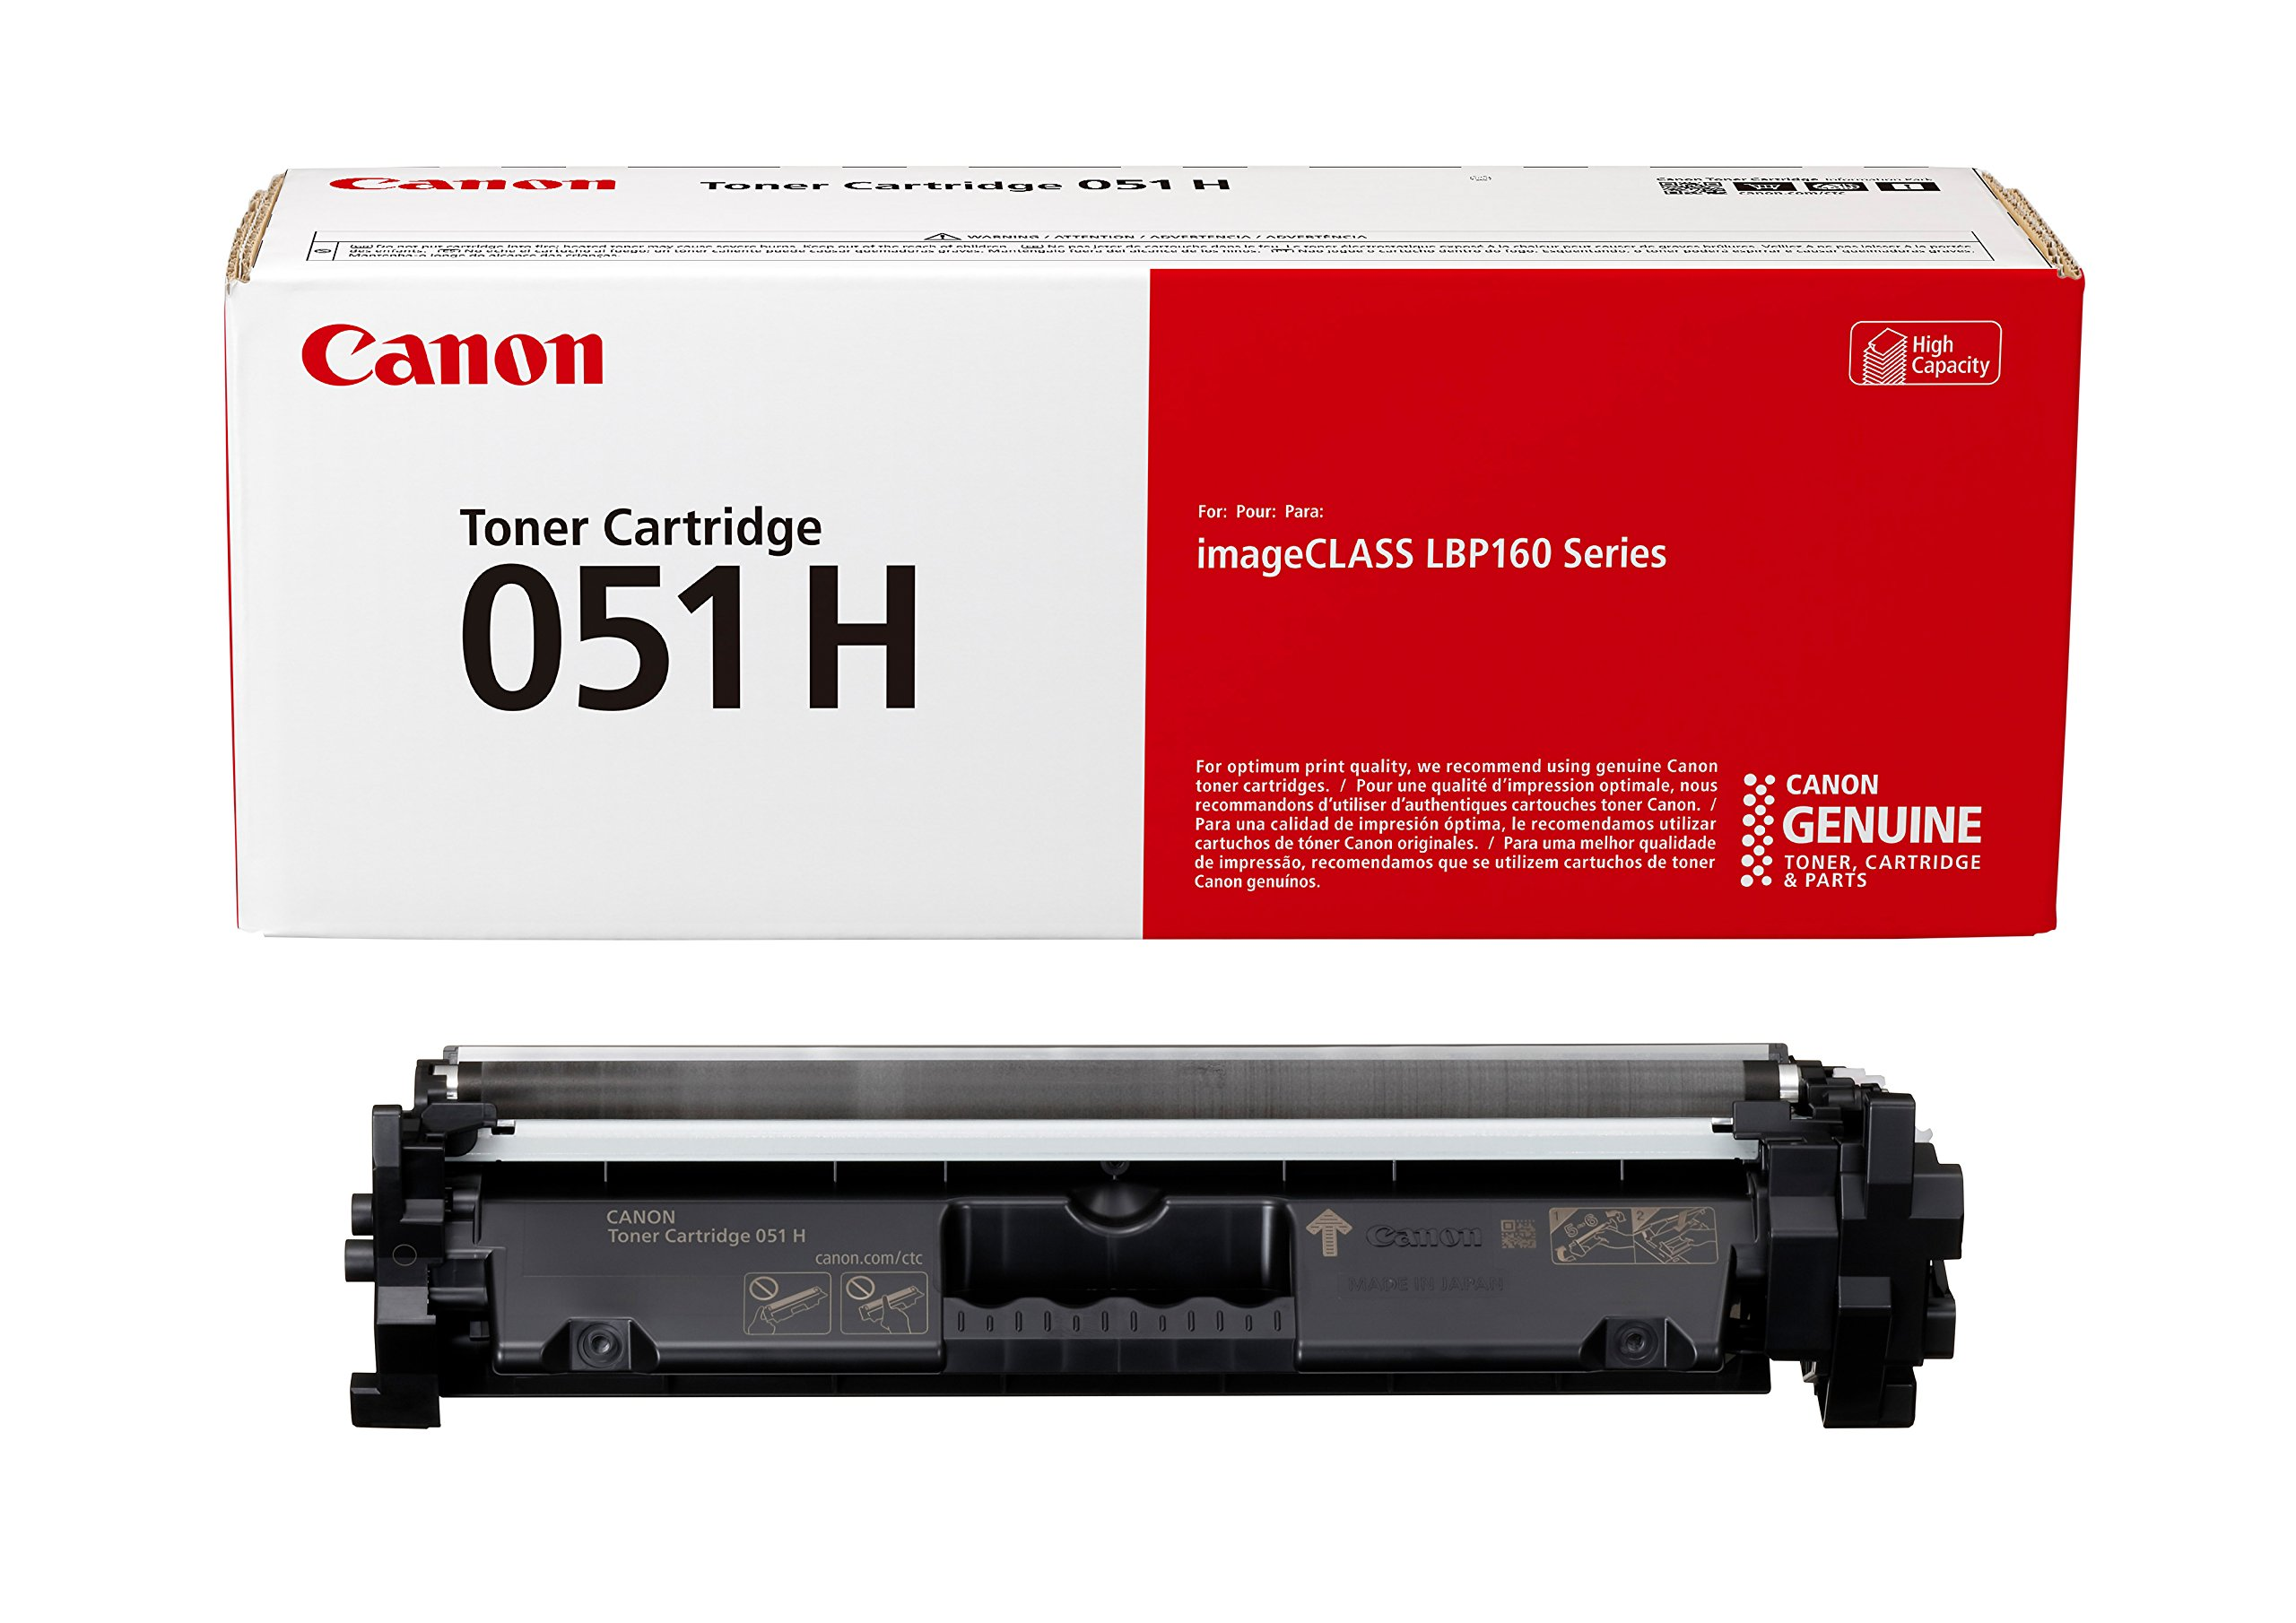 Canon Genuine Toner Cartridge 051 Black, High Capacity (2169C001), 1-Pack, for Canon imageCLASS MF264dw, MF267dw, MF269dw, LBP162dw Laser Printers